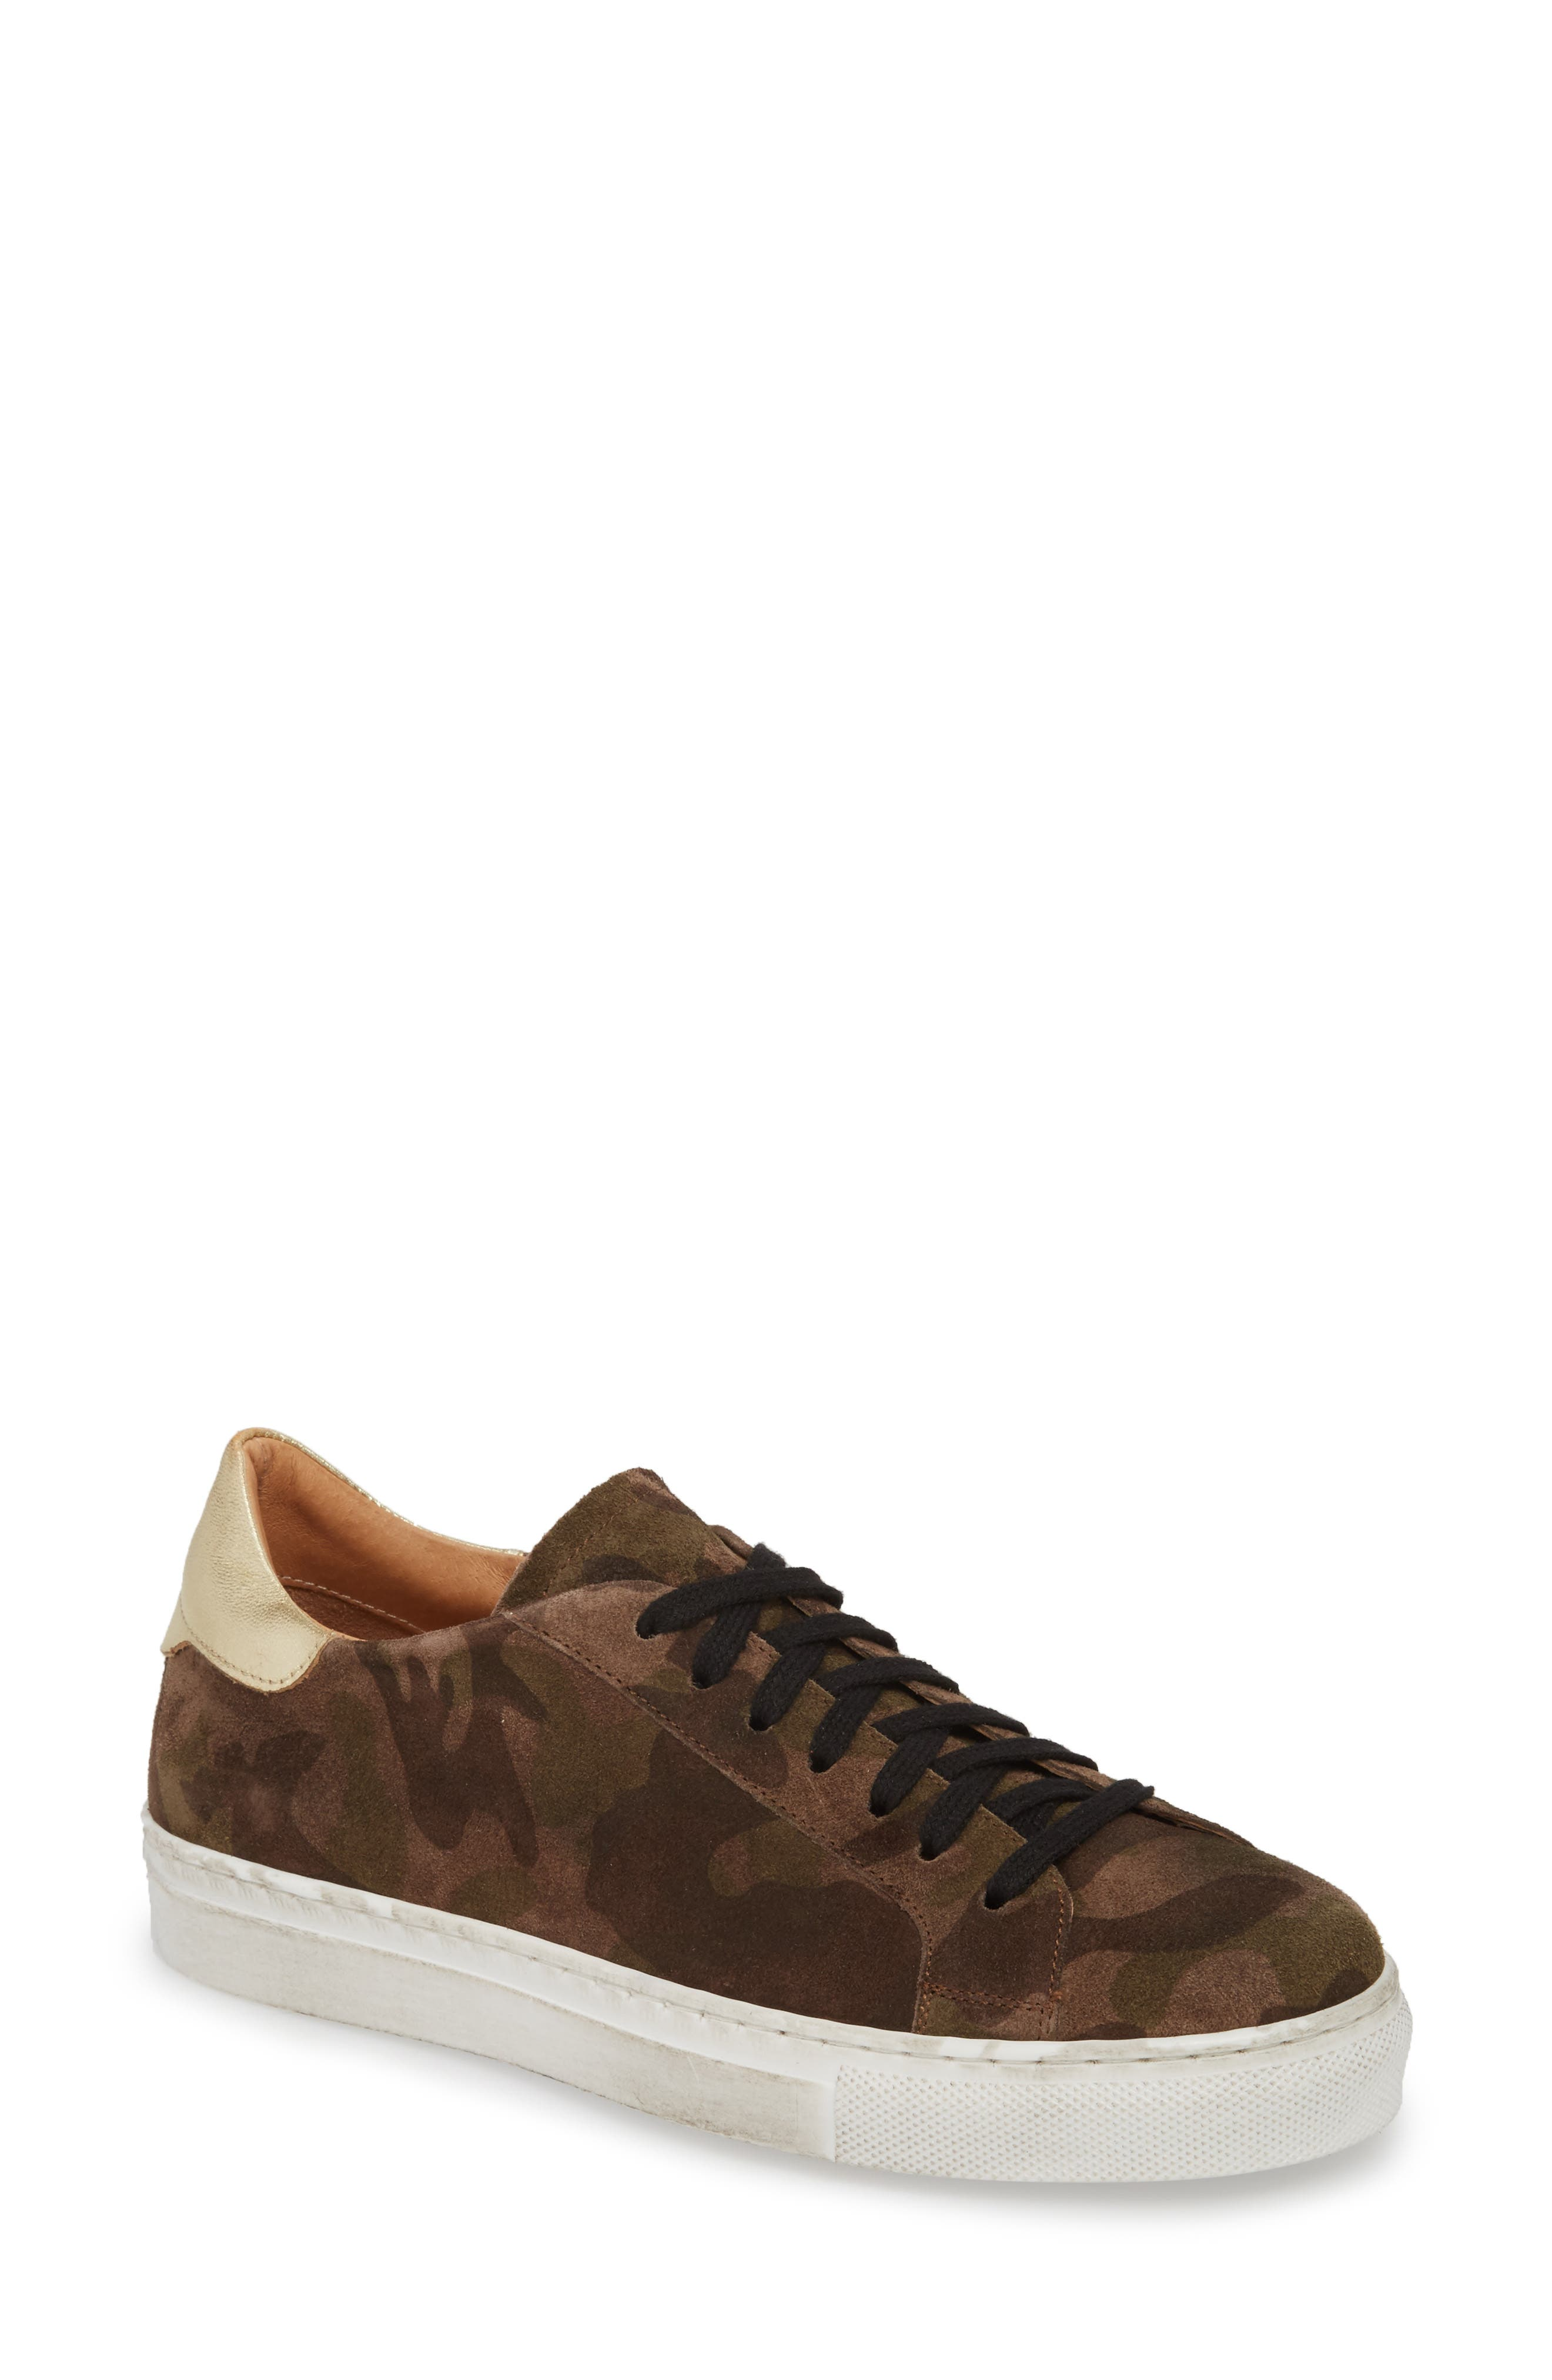 Orissa Sneaker,                         Main,                         color, Military Print Suede